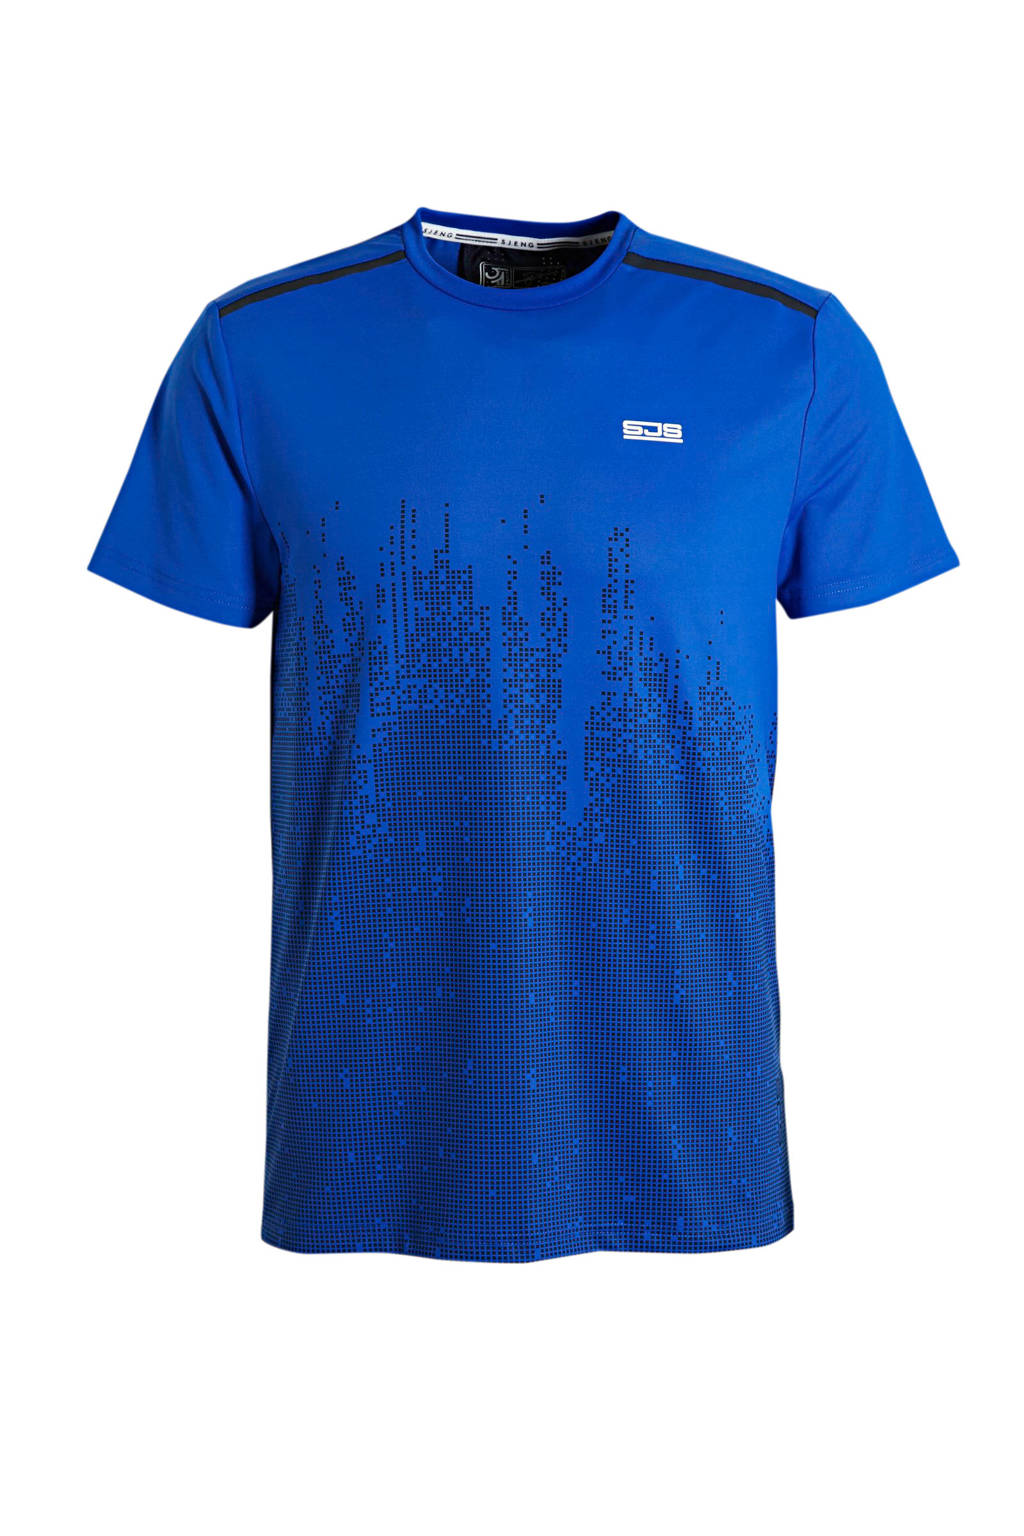 Sjeng Sports   T-shirt blauw, Blauw